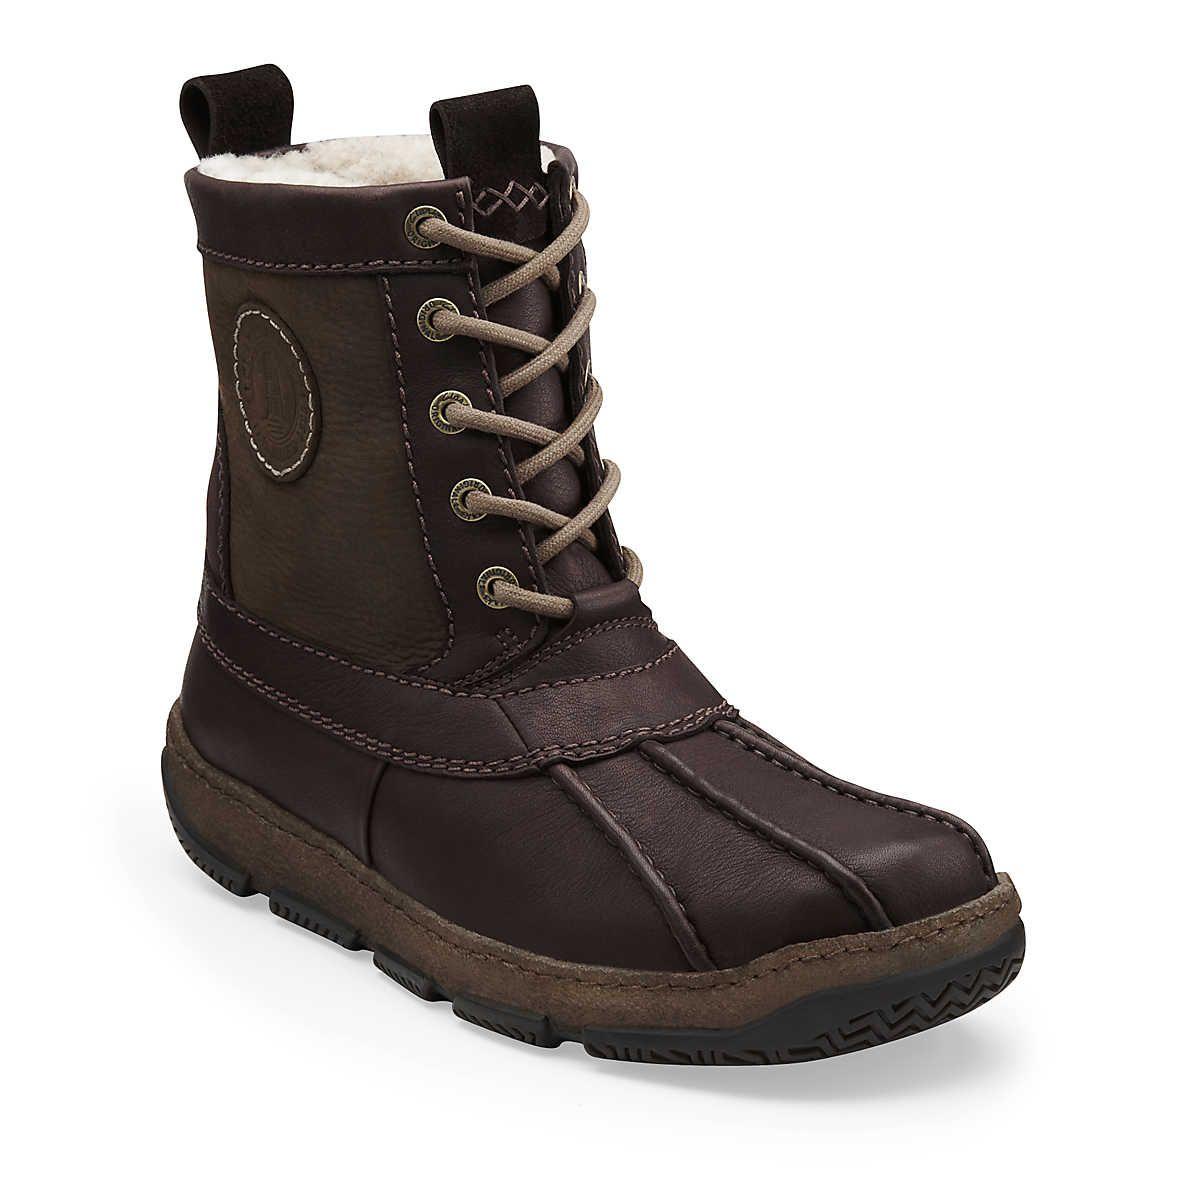 clarks winter boots mens